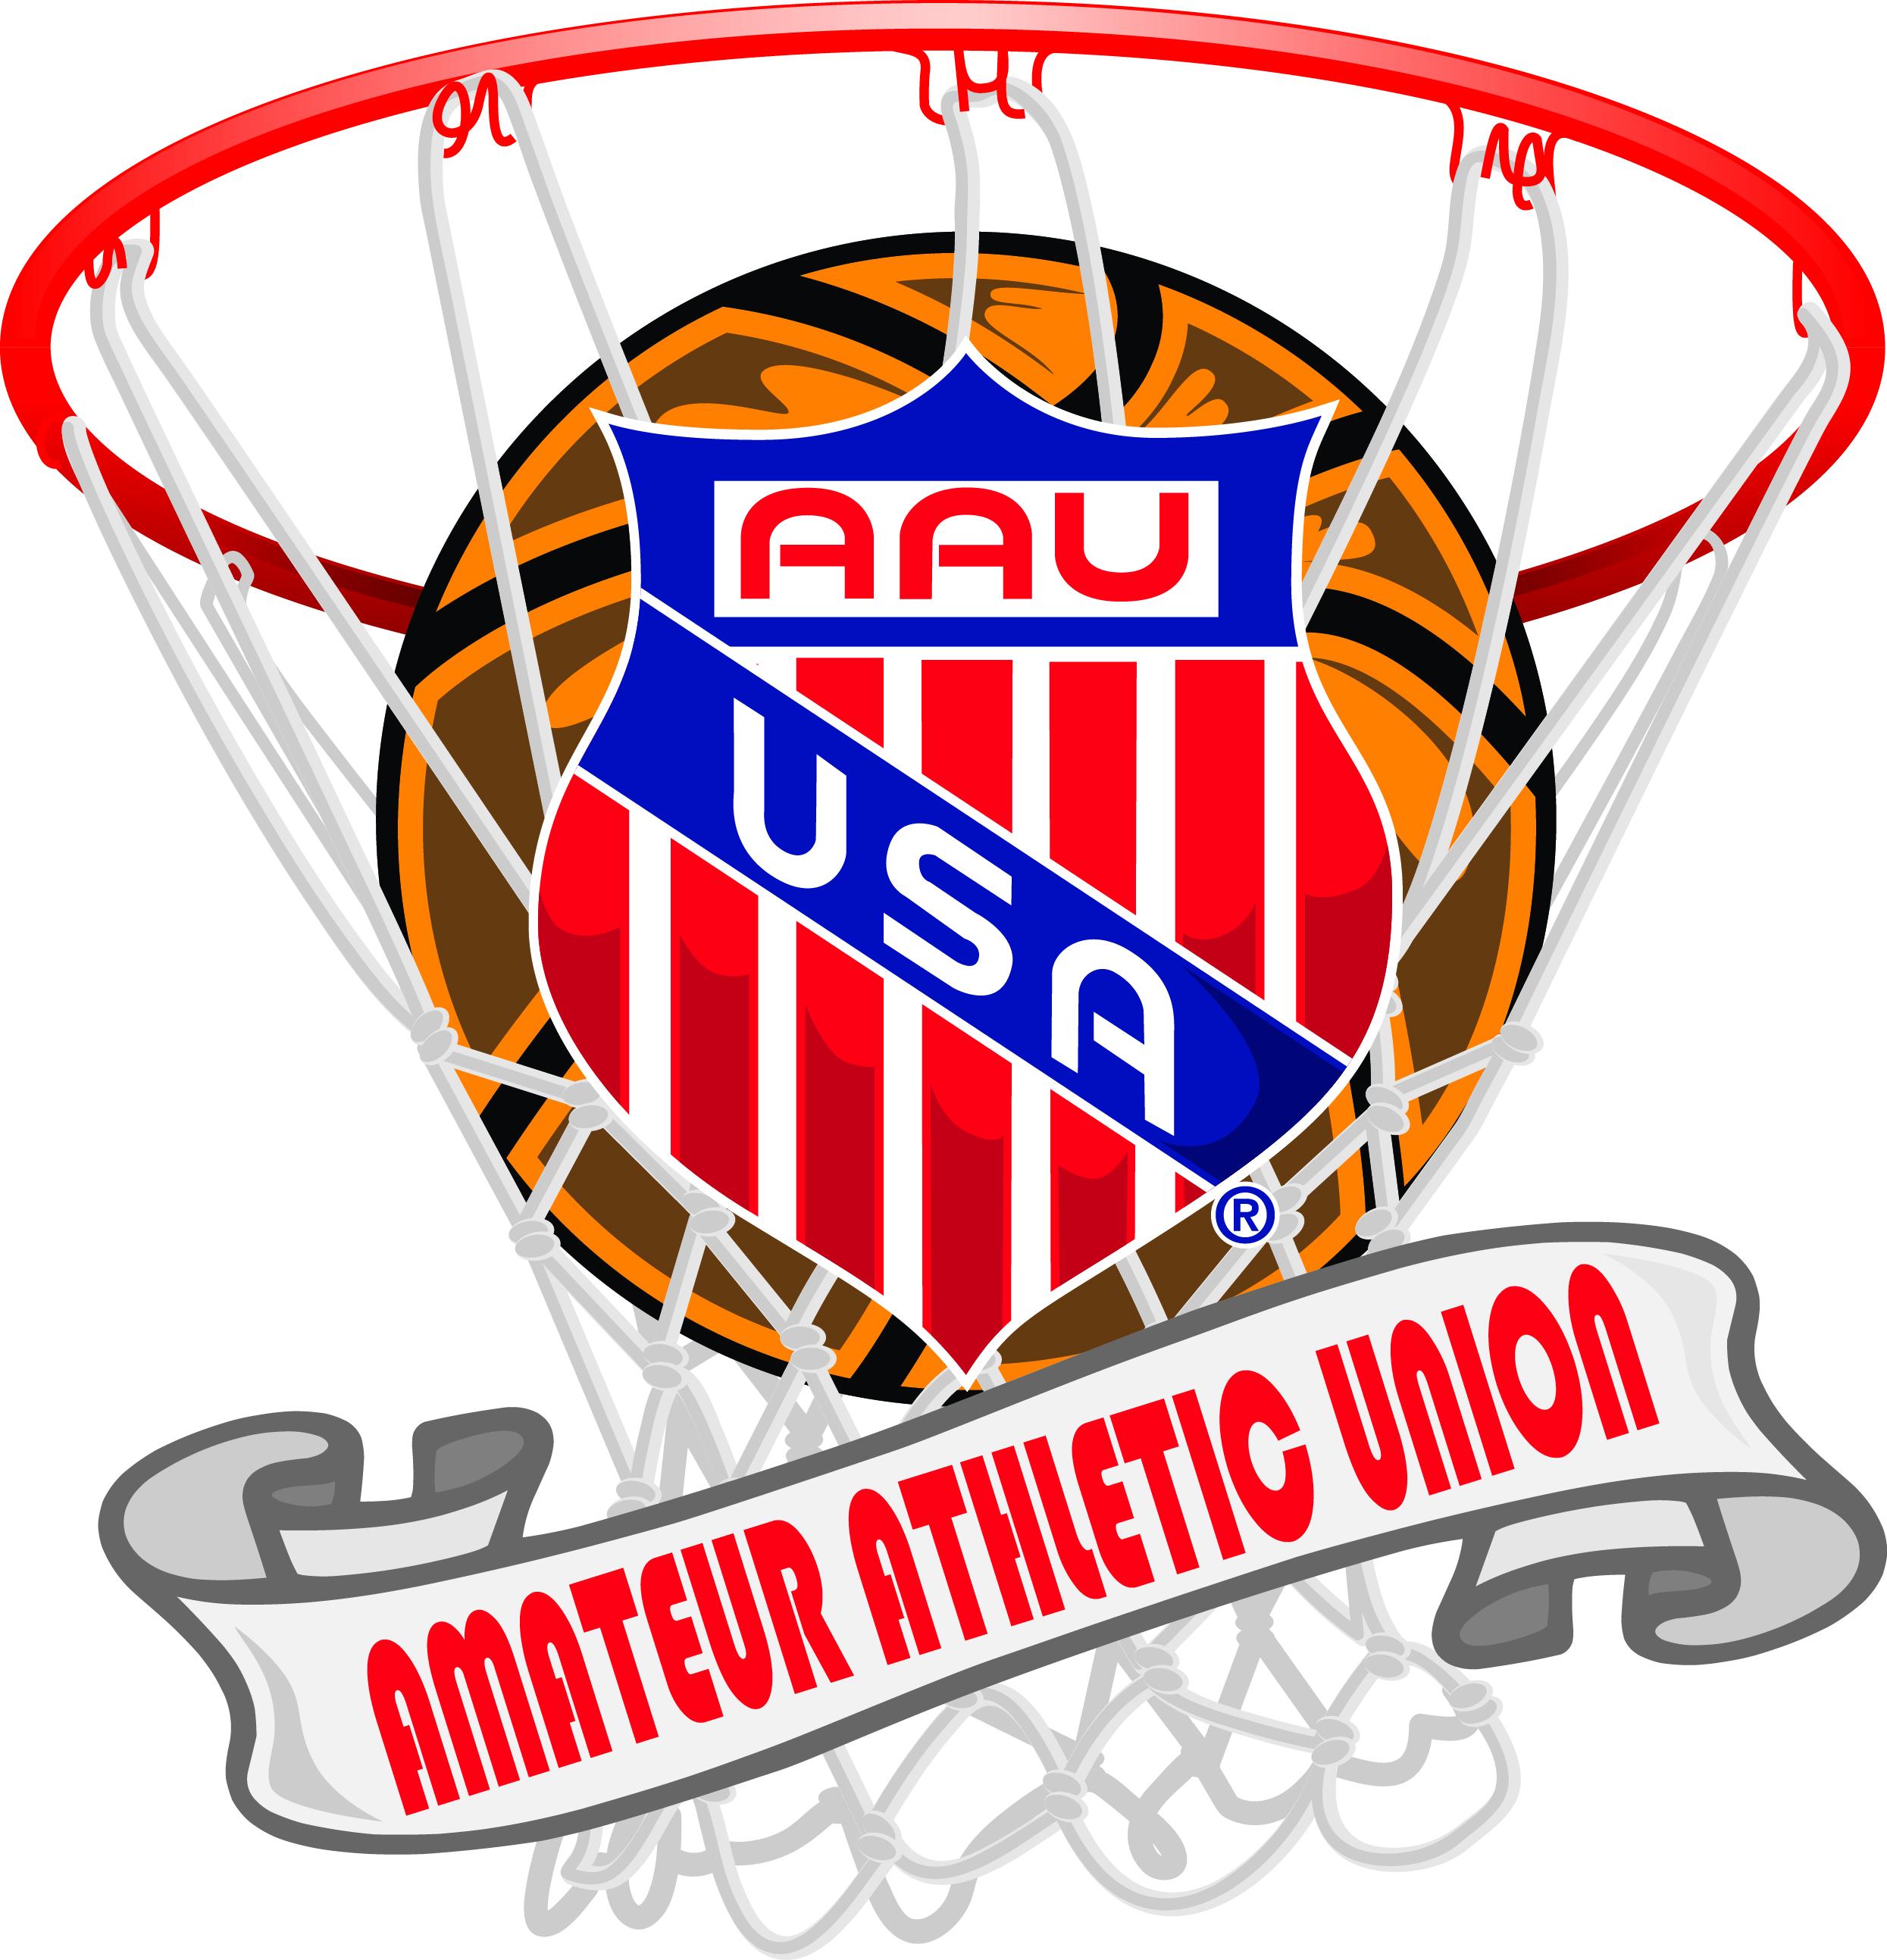 Central Western AAU - aau-basketball-logo